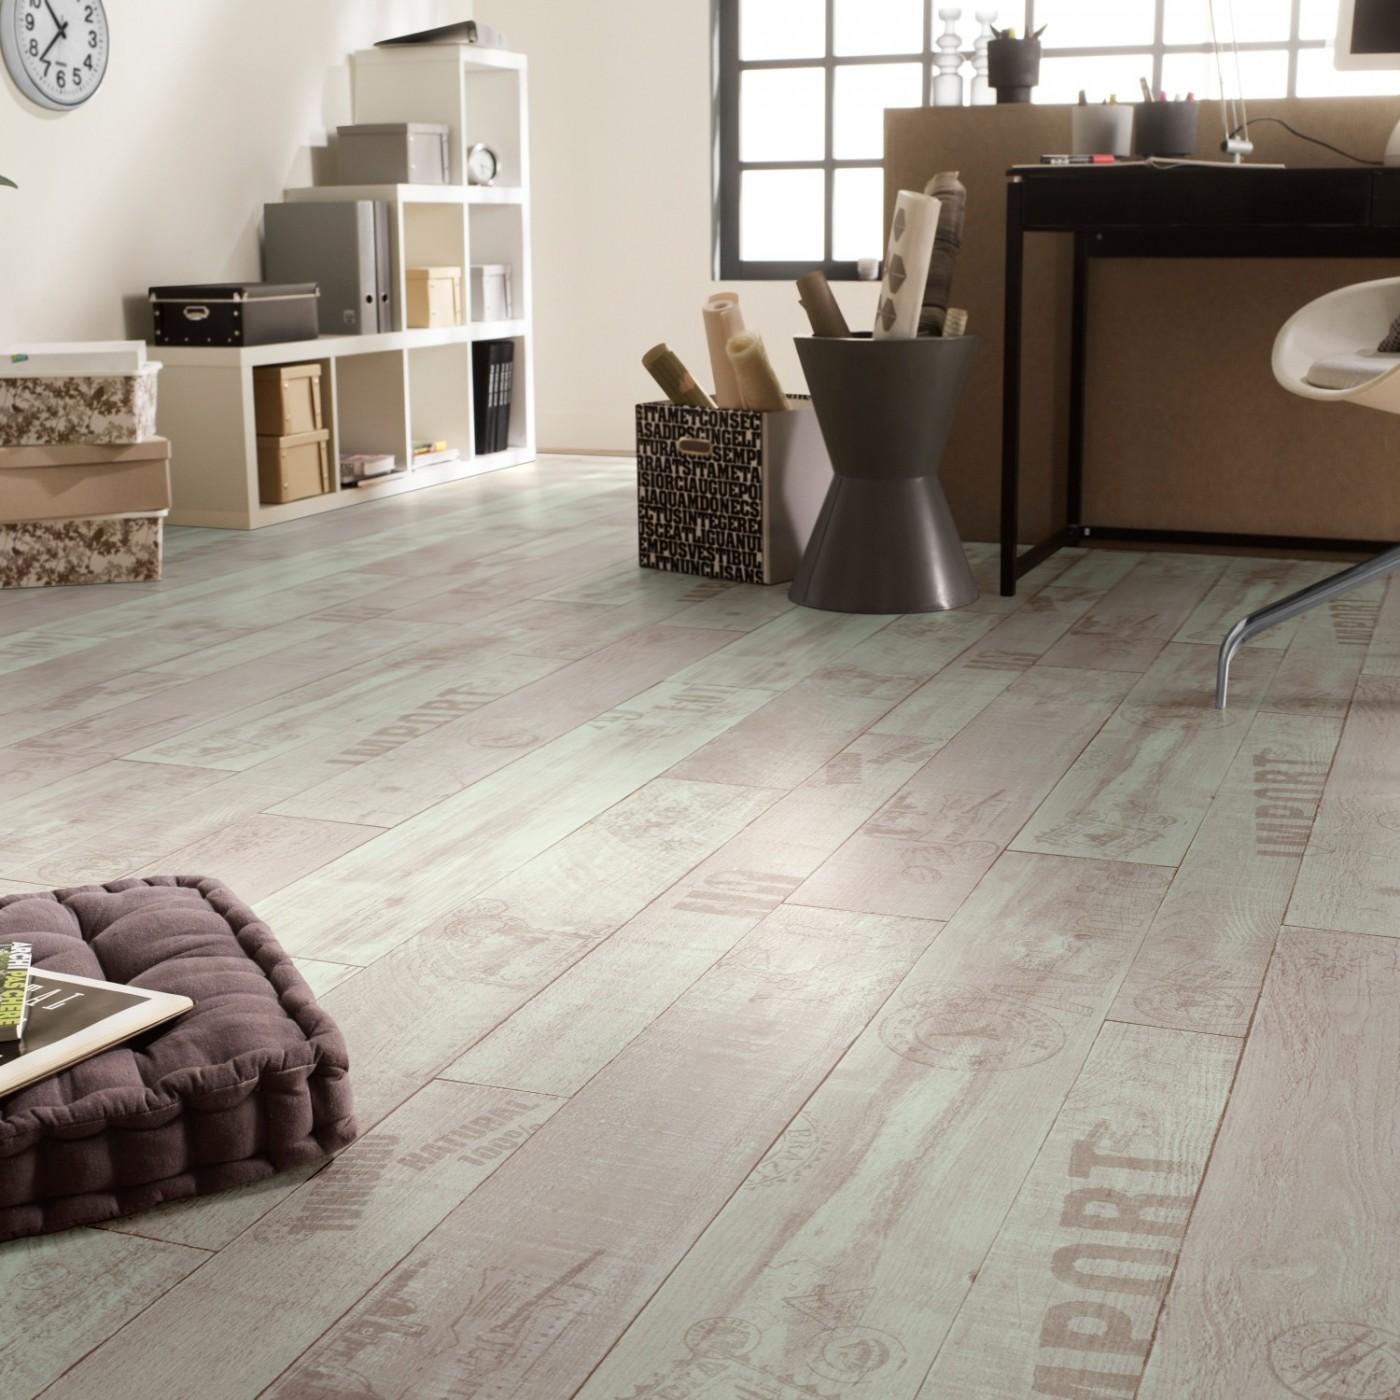 Cushioned vinyls grosvenor flooring norwich for Wood effect cushion flooring